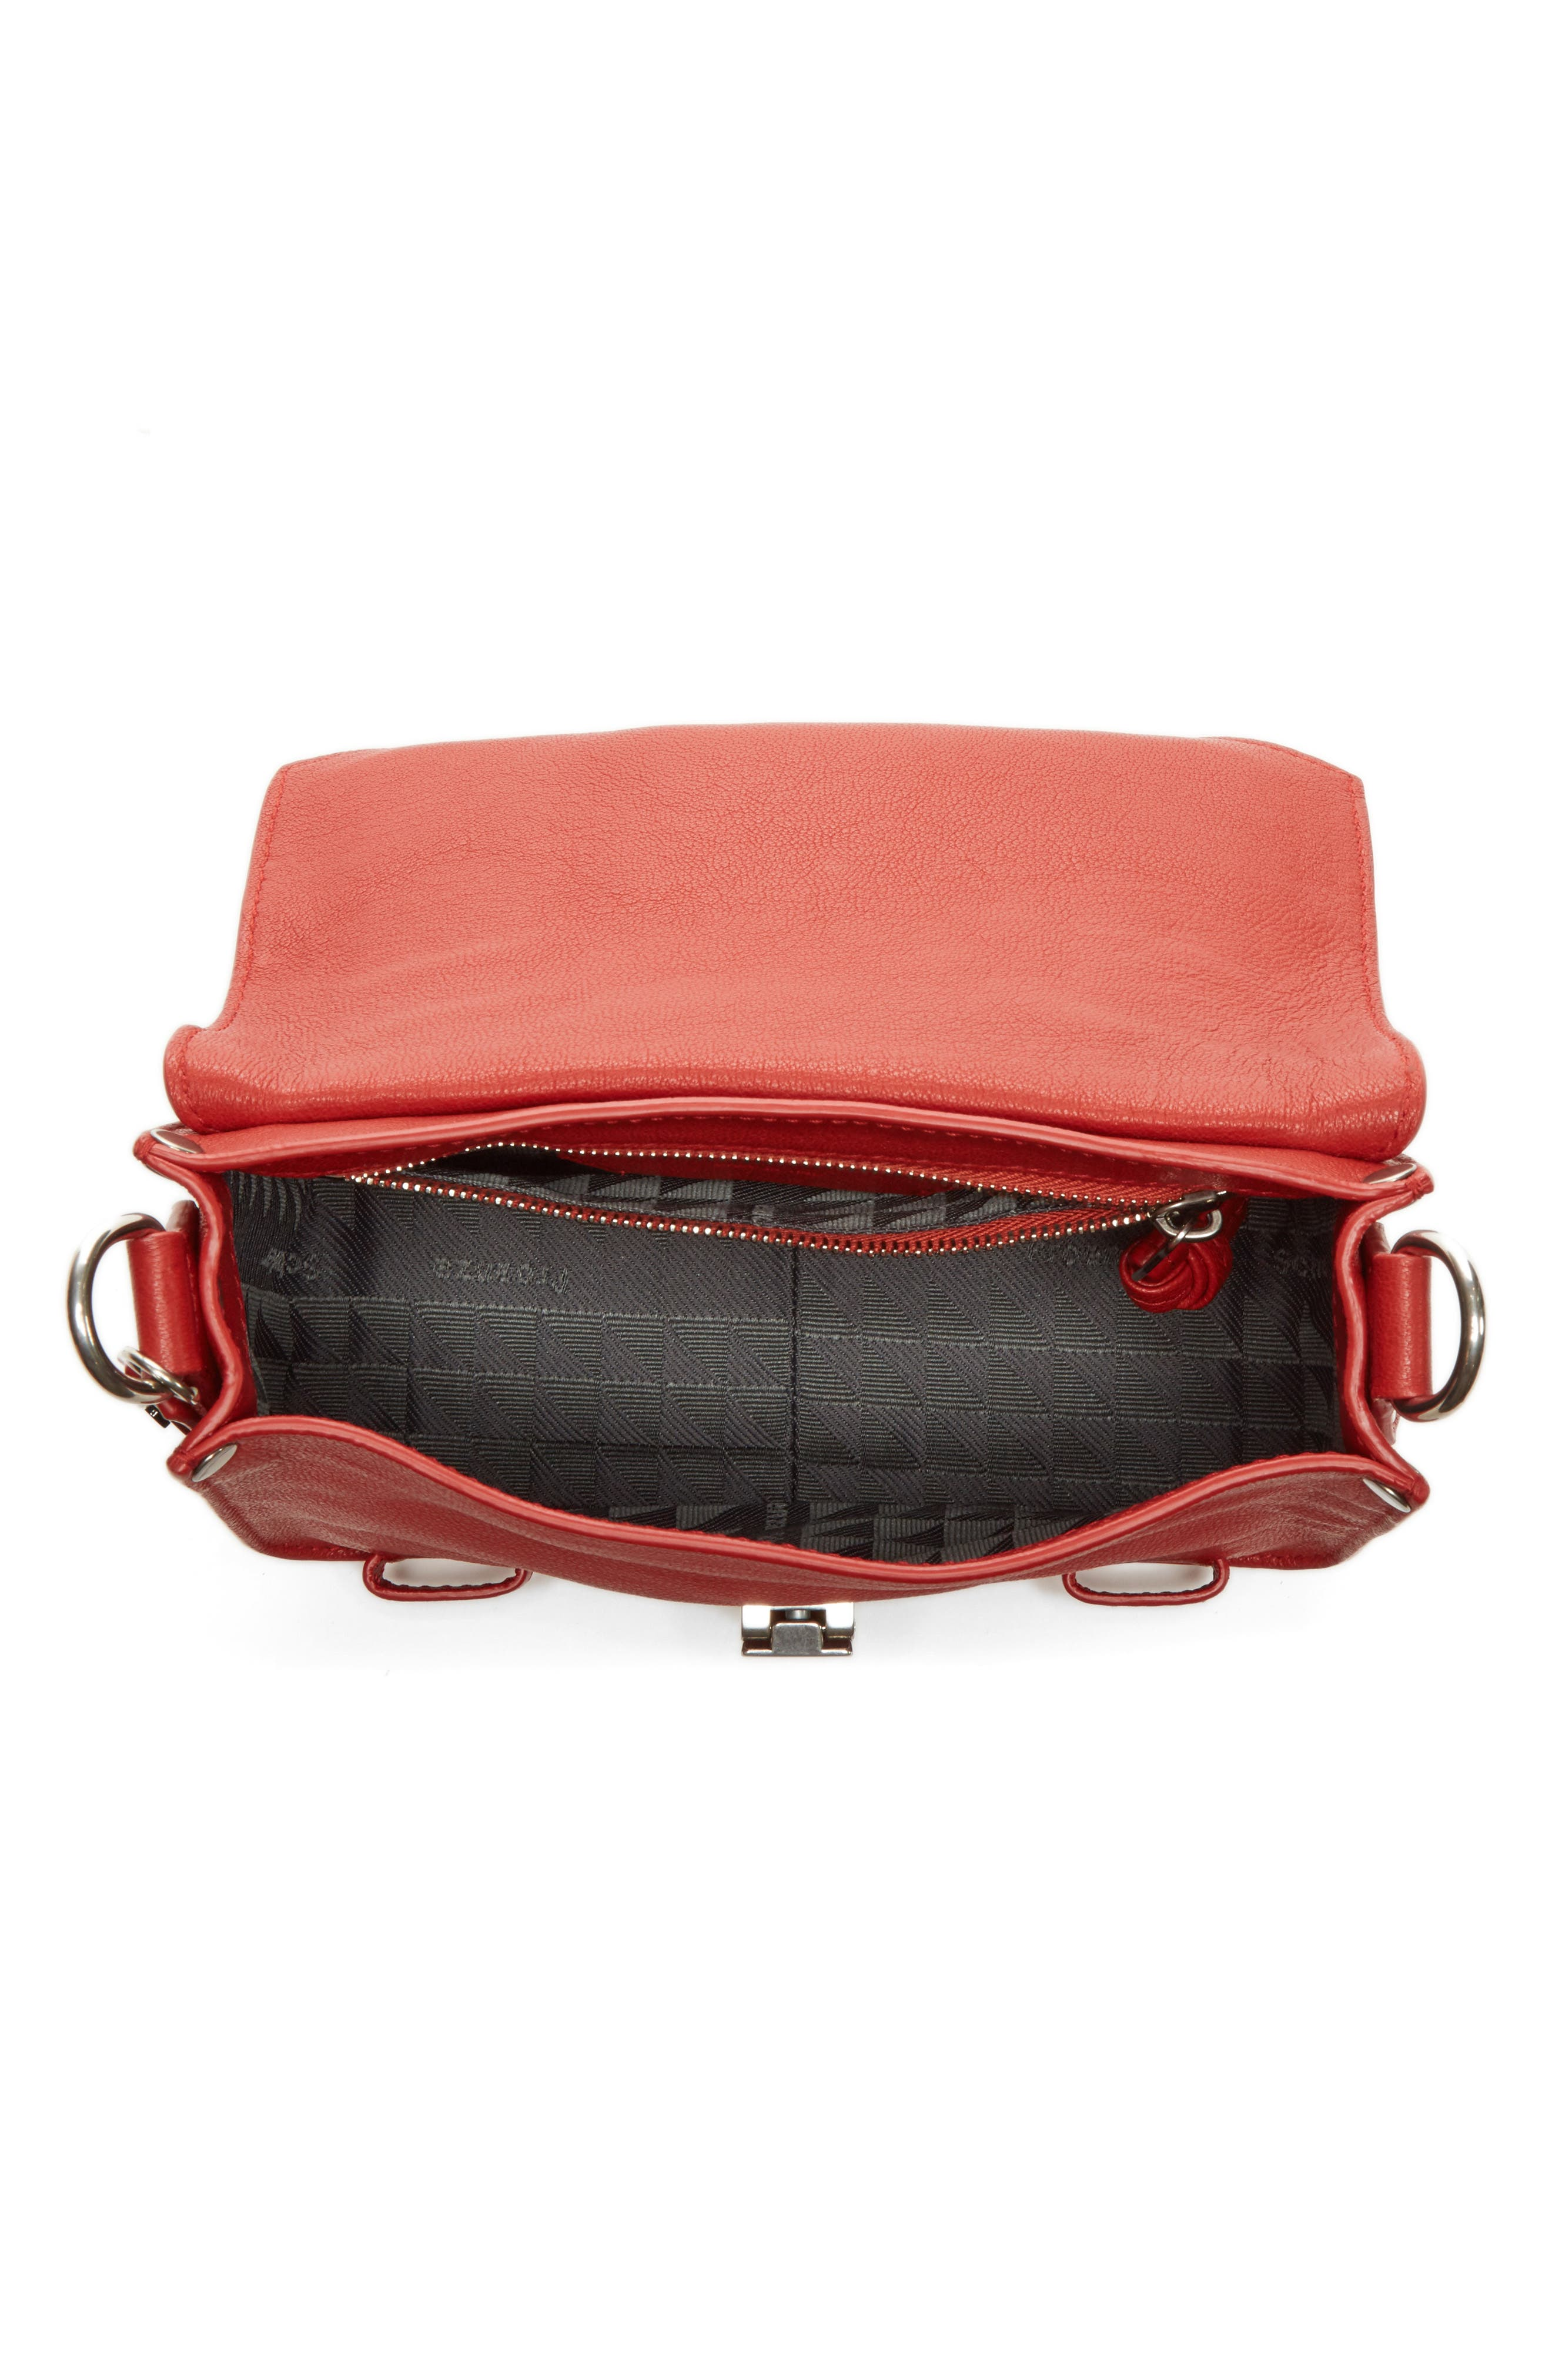 Alternate Image 3  - Proenza Schouler Medium PS1 Patchwork Leather Satchel